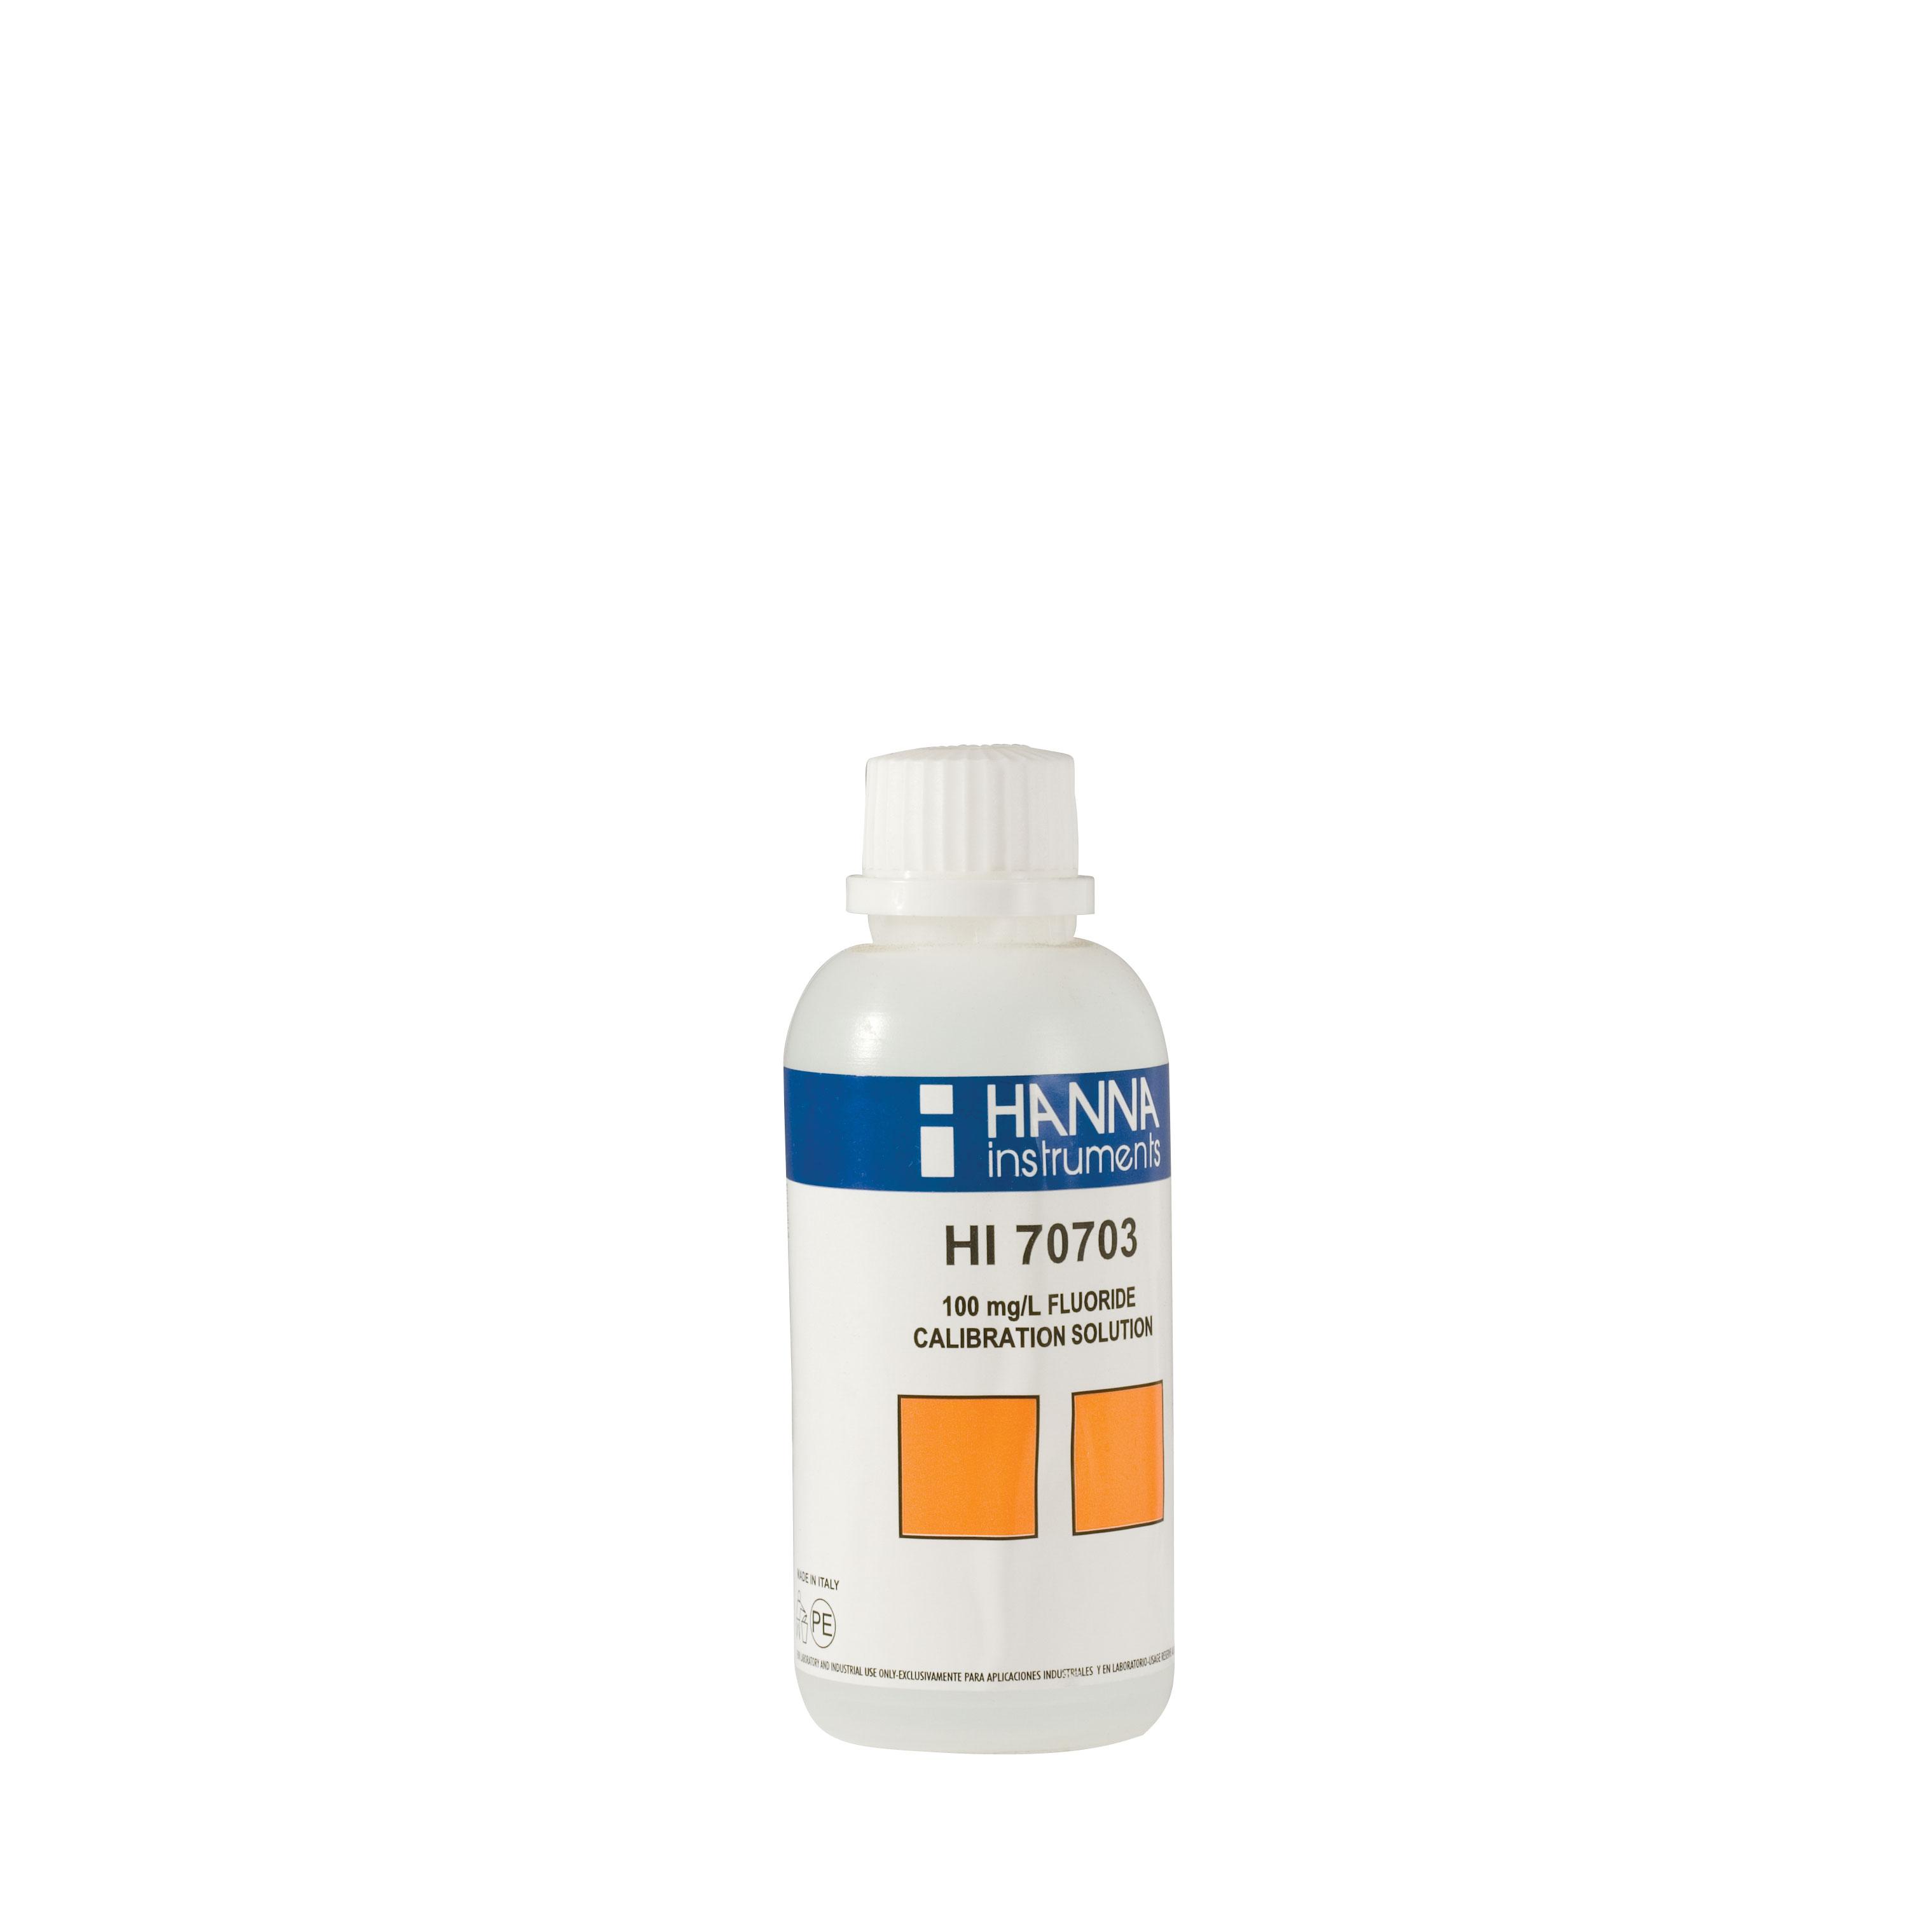 Solución Estándar de Fluoruro 100 mg/L (230 mL) - HI70703M